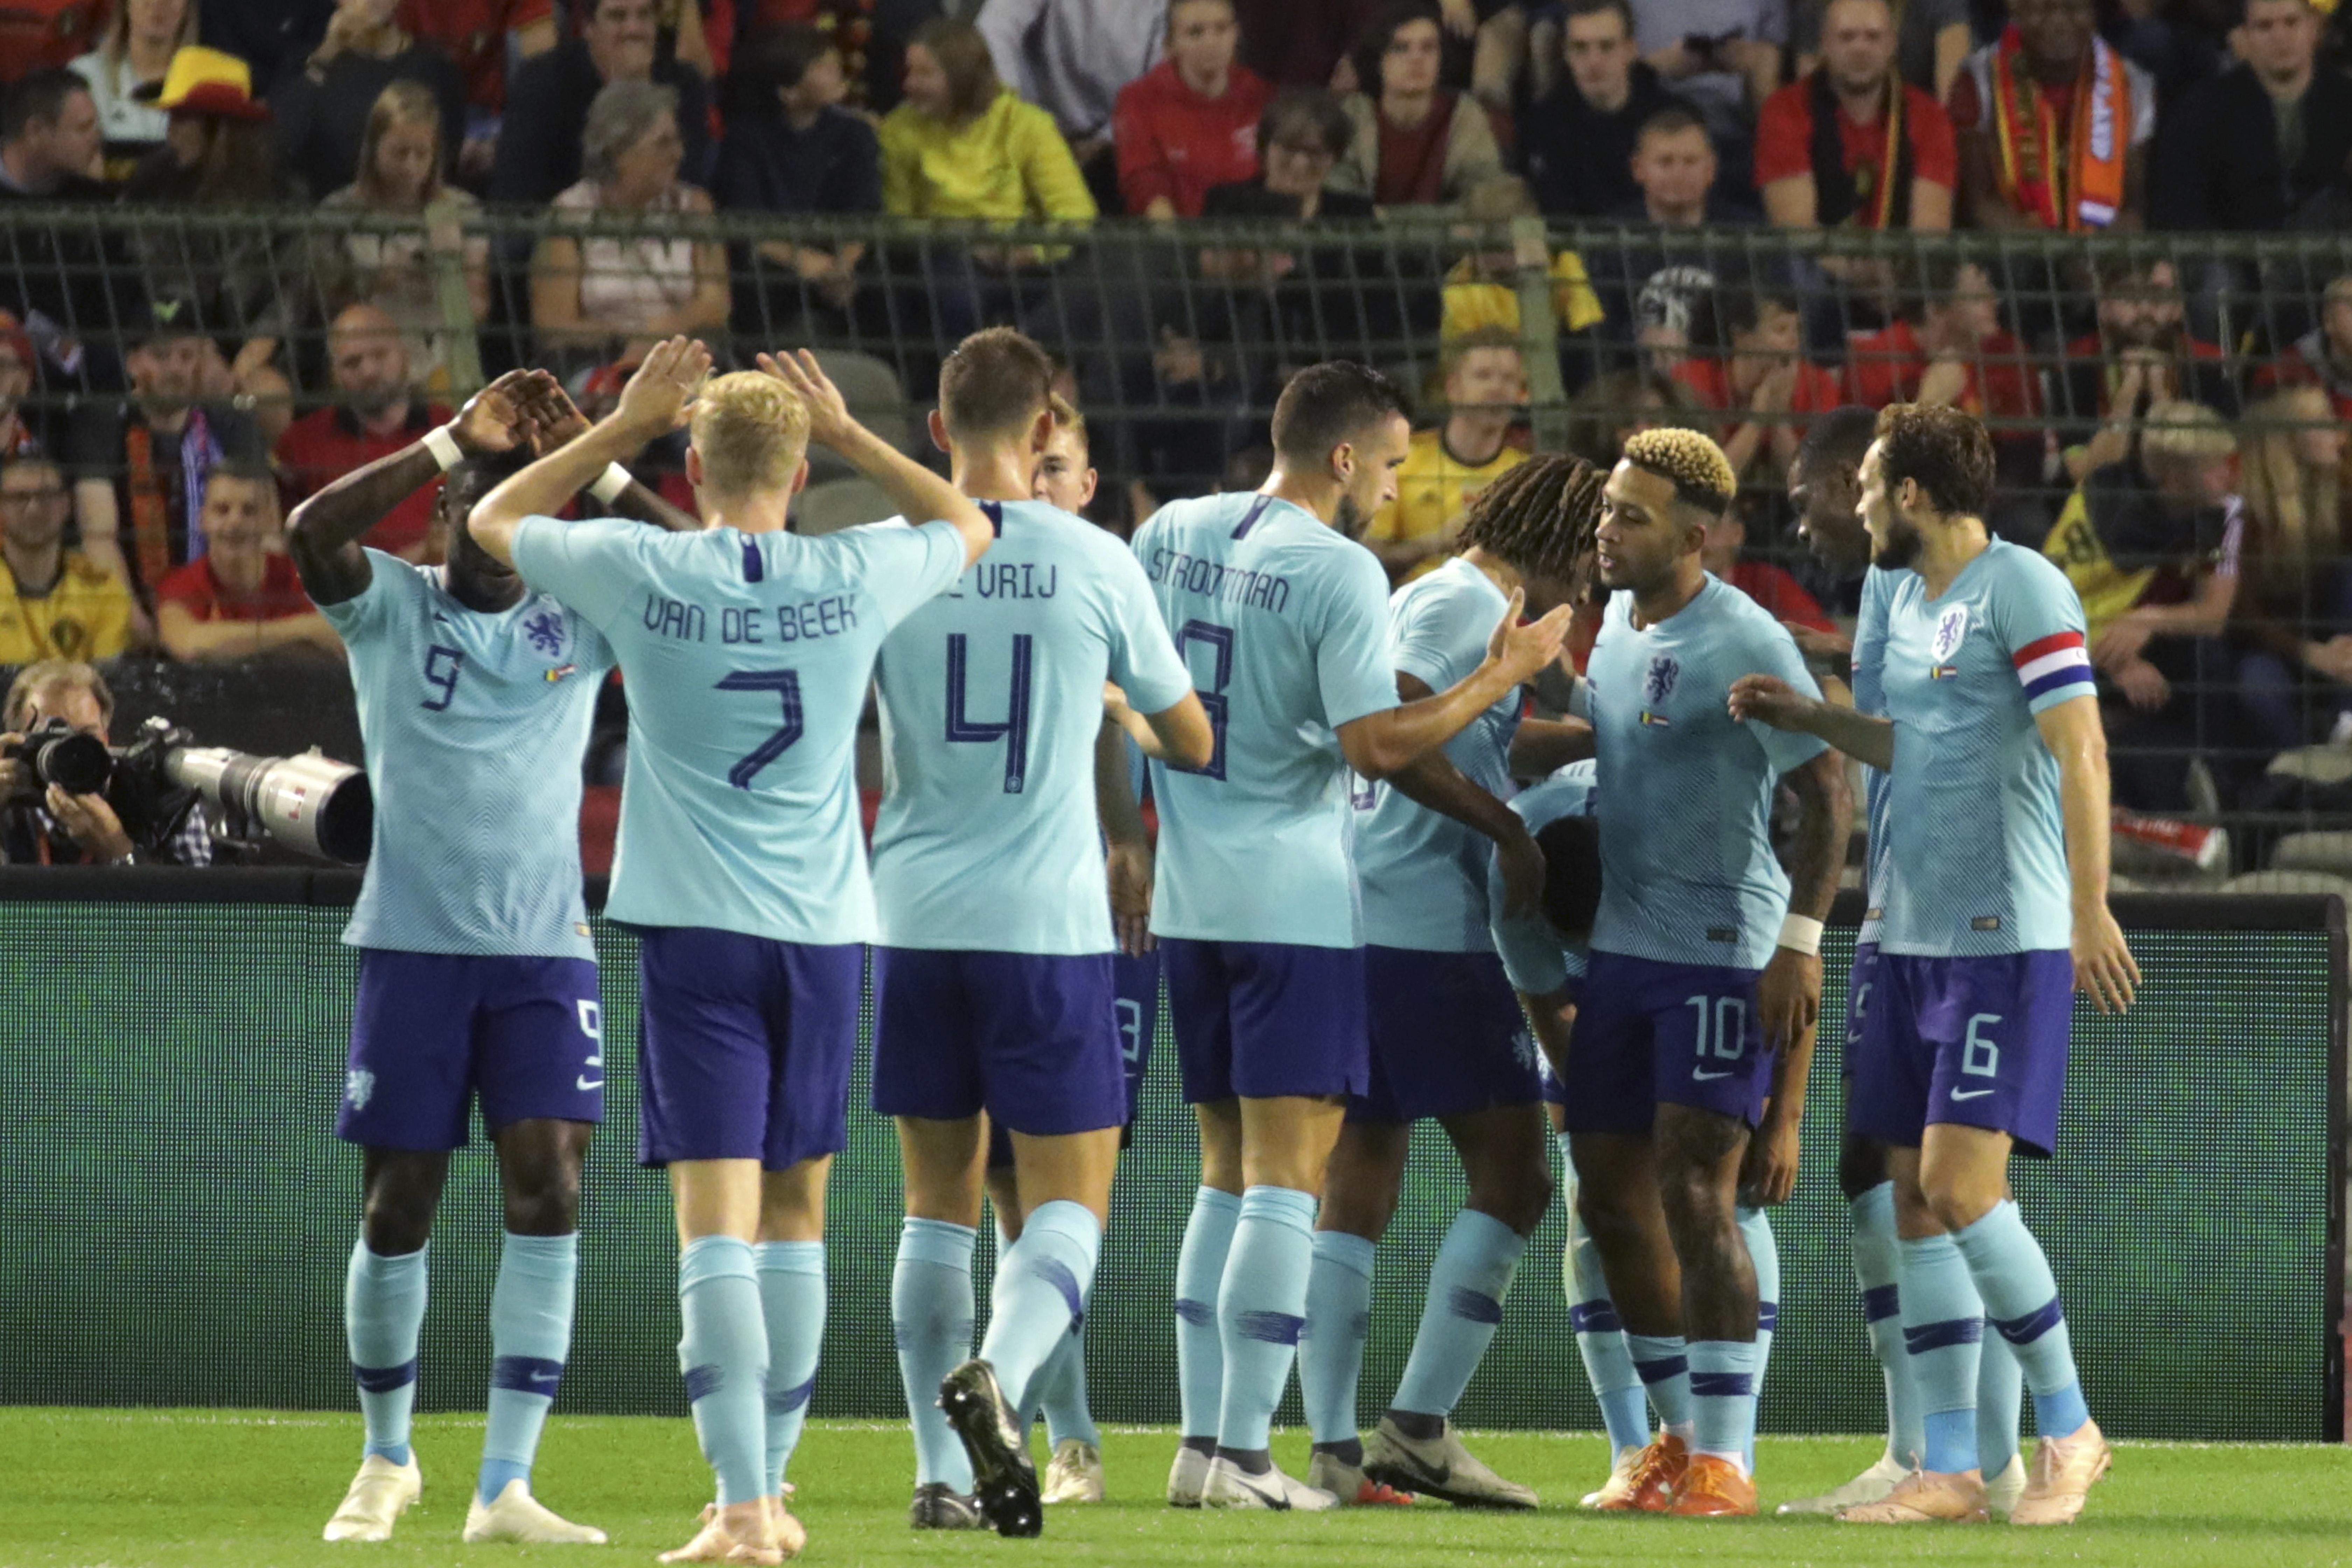 Groeneveld scores as Netherlands draws 1-1 with Belgium